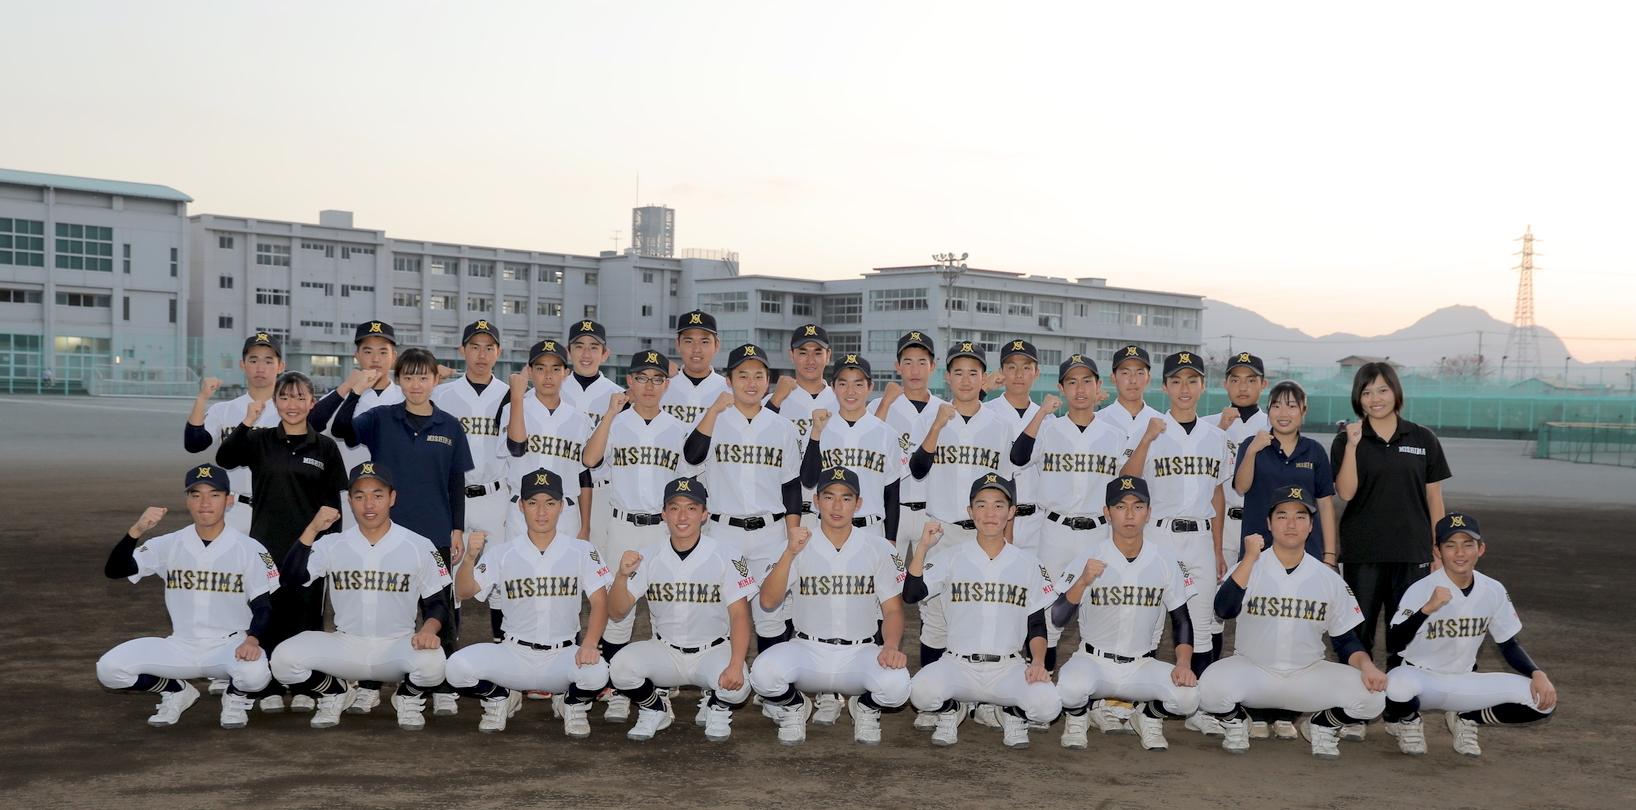 【三島南 野球部】「62年ぶり県4強」 #三島南